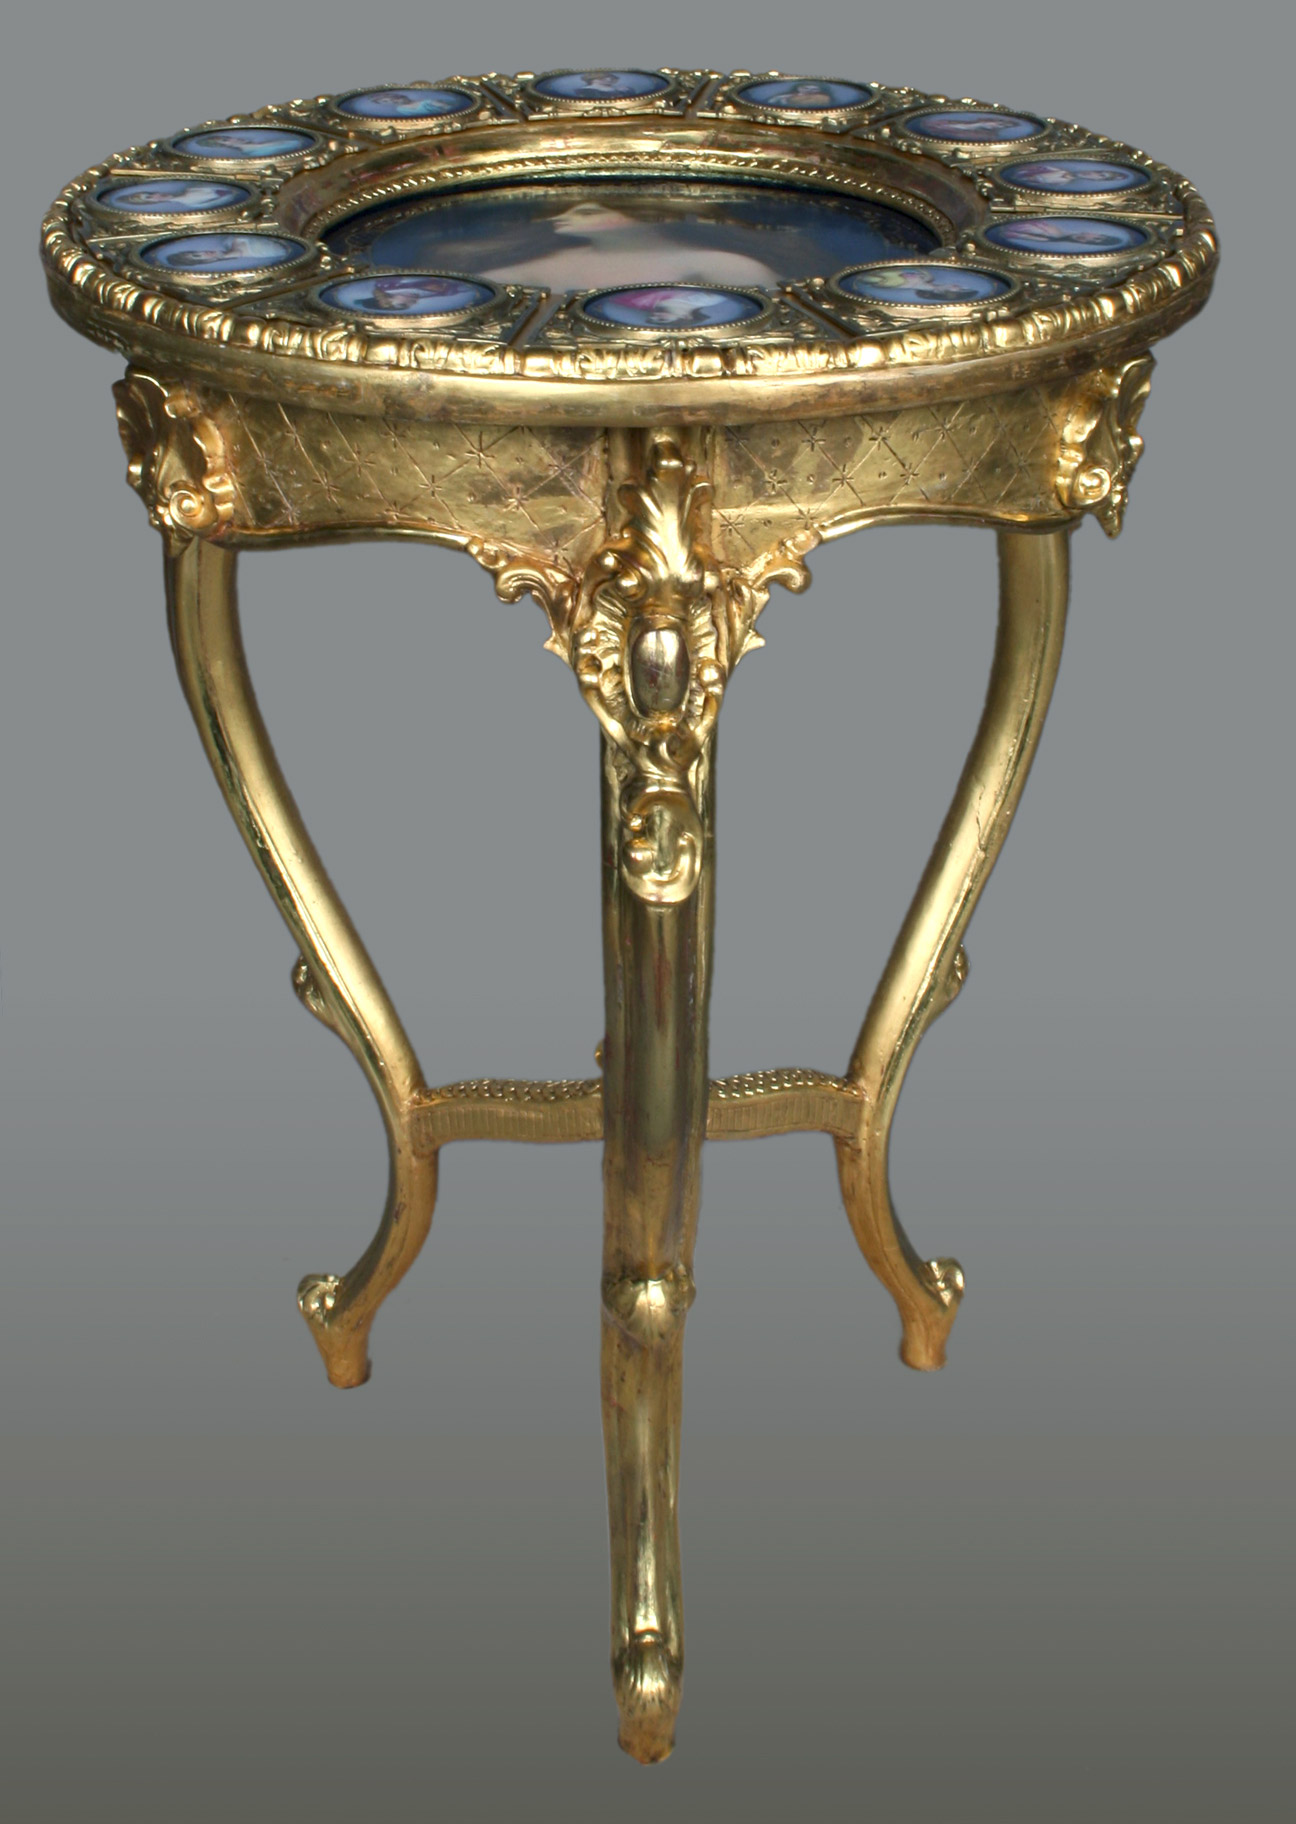 restored-giltwood-table.jpg